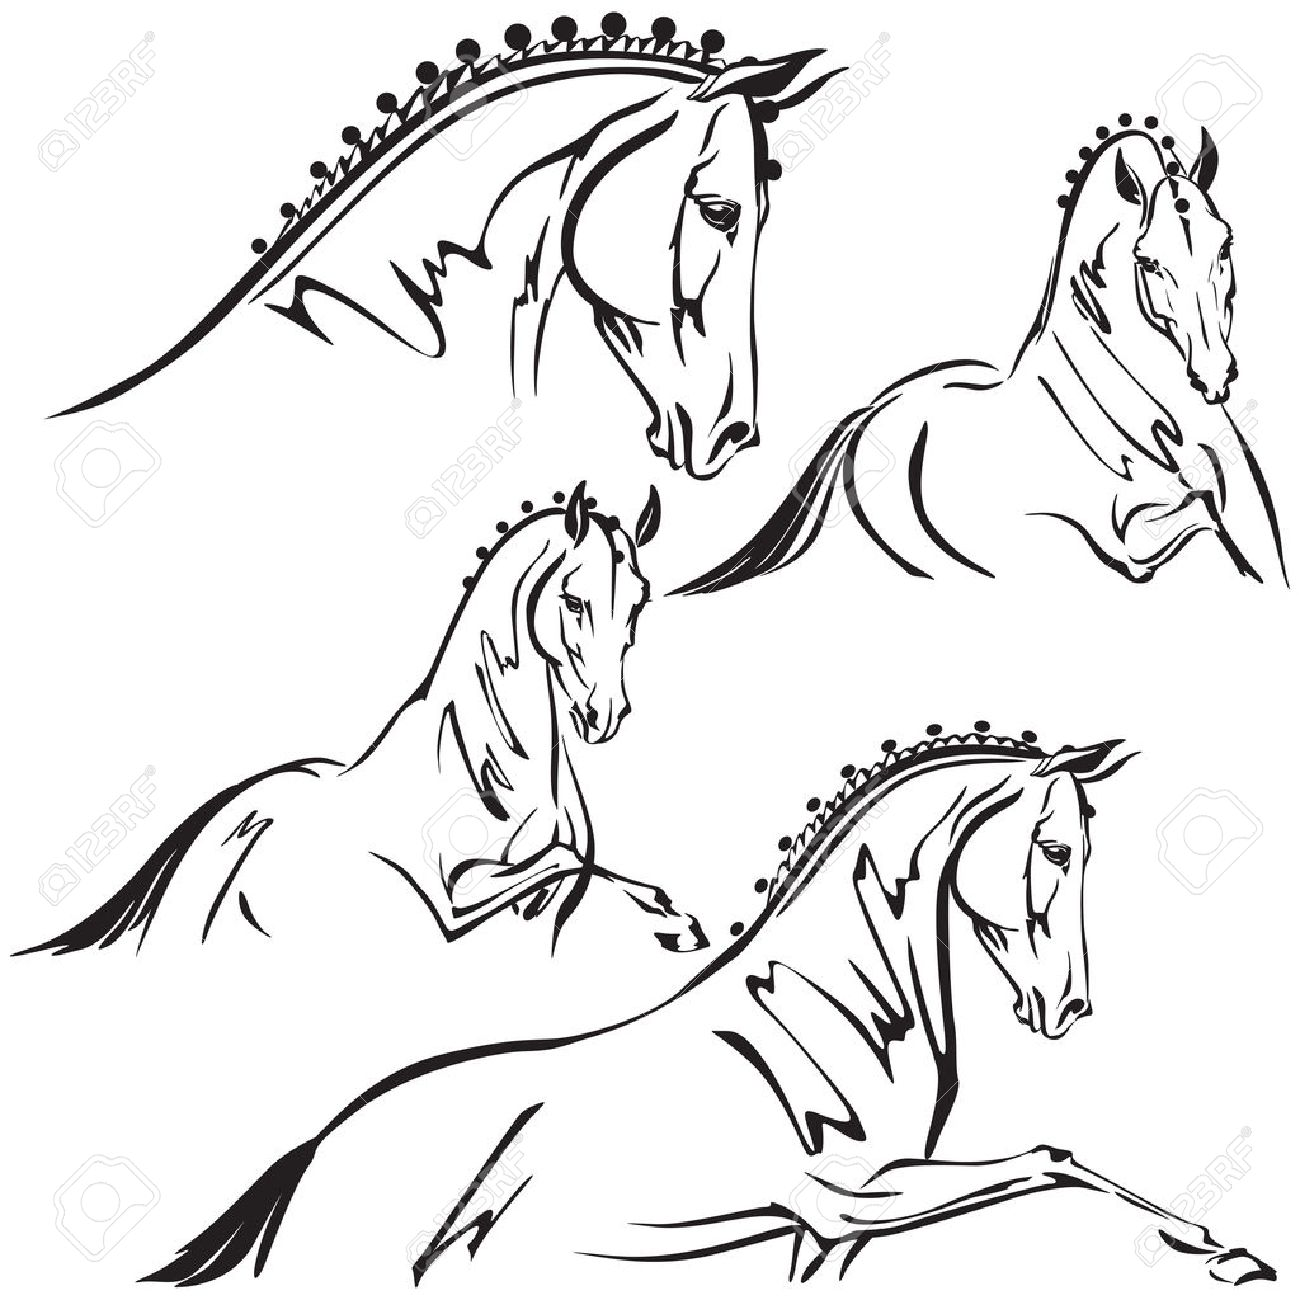 1300x1300 Dressage Horses For Trailer Design Royalty Free Cliparts, Vectors